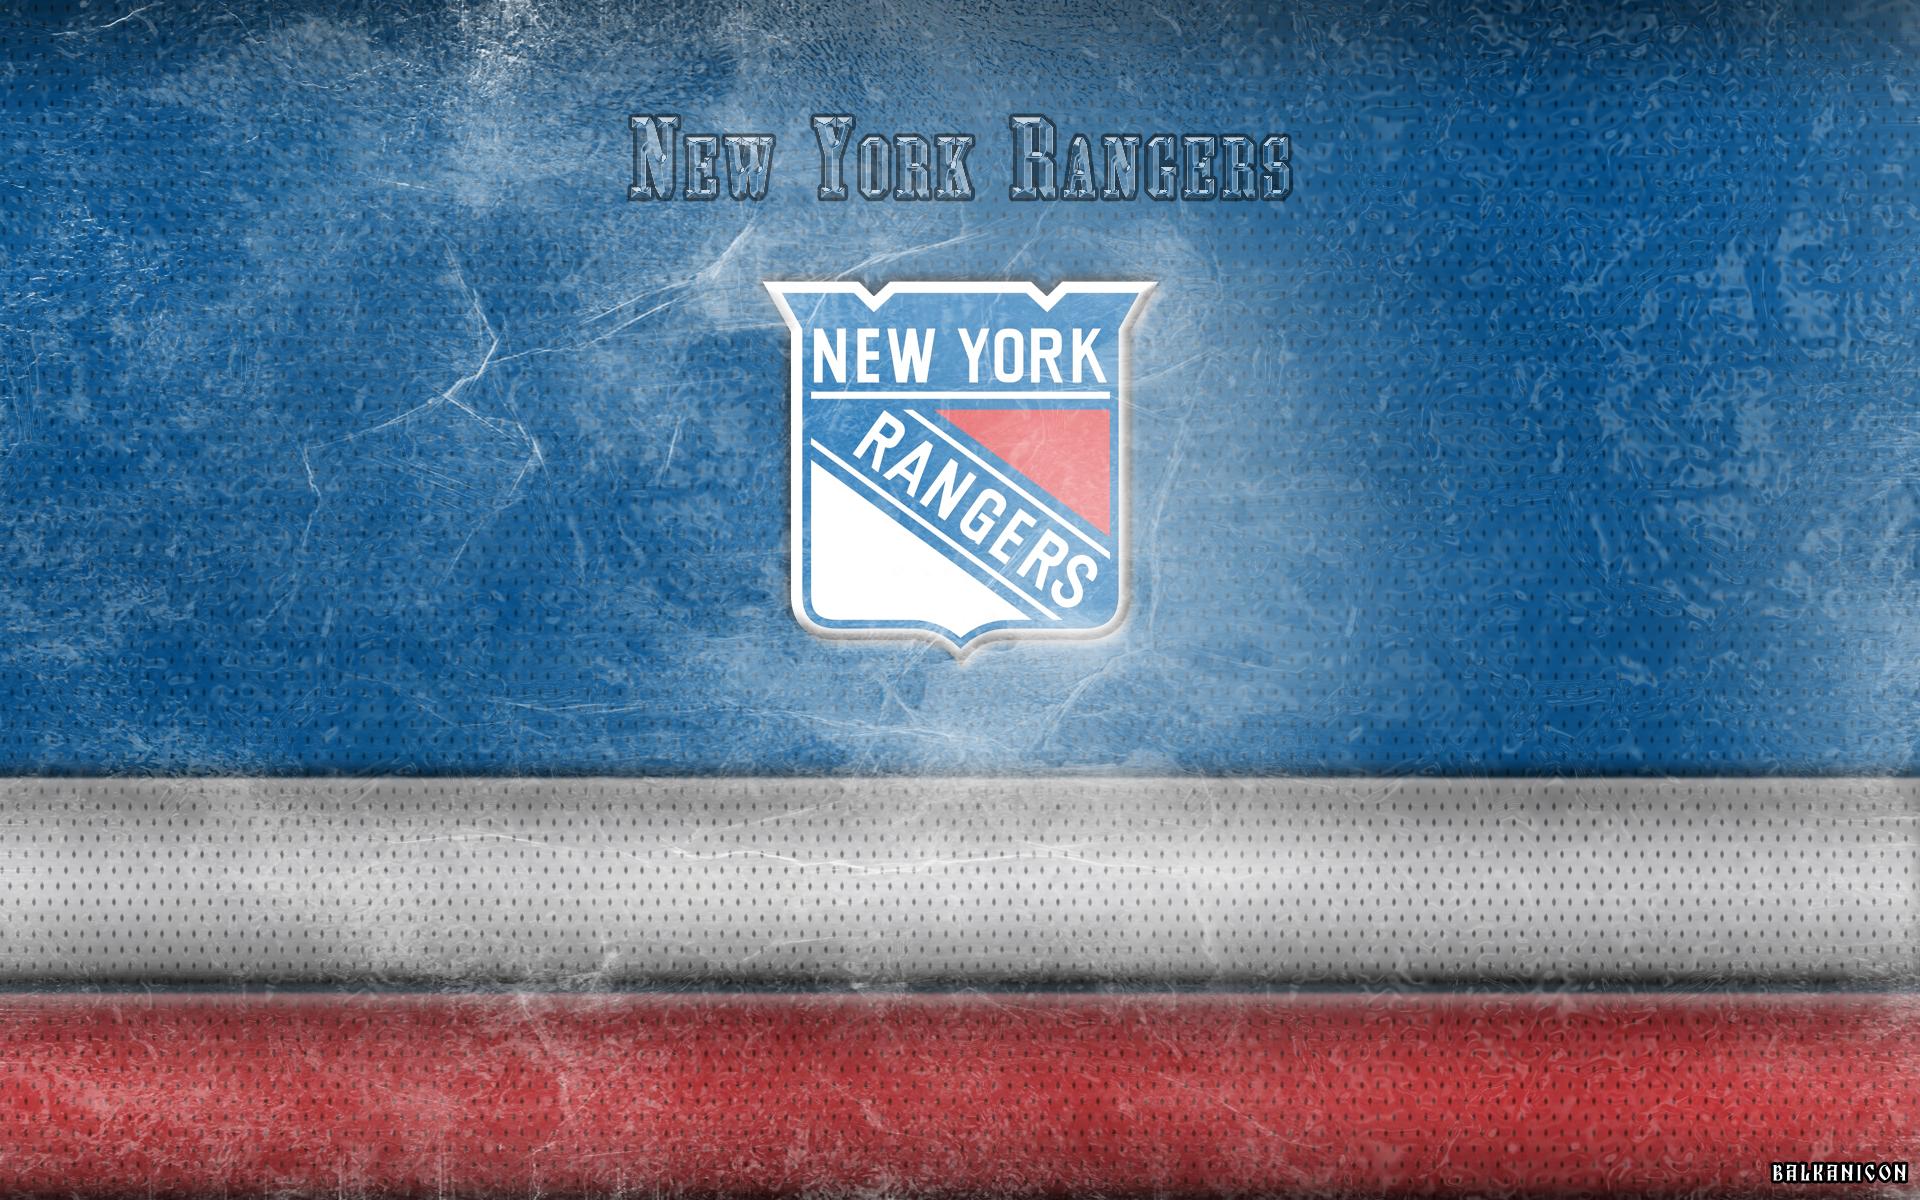 New York Rangers wallpaper by Balkanicon 1920x1200